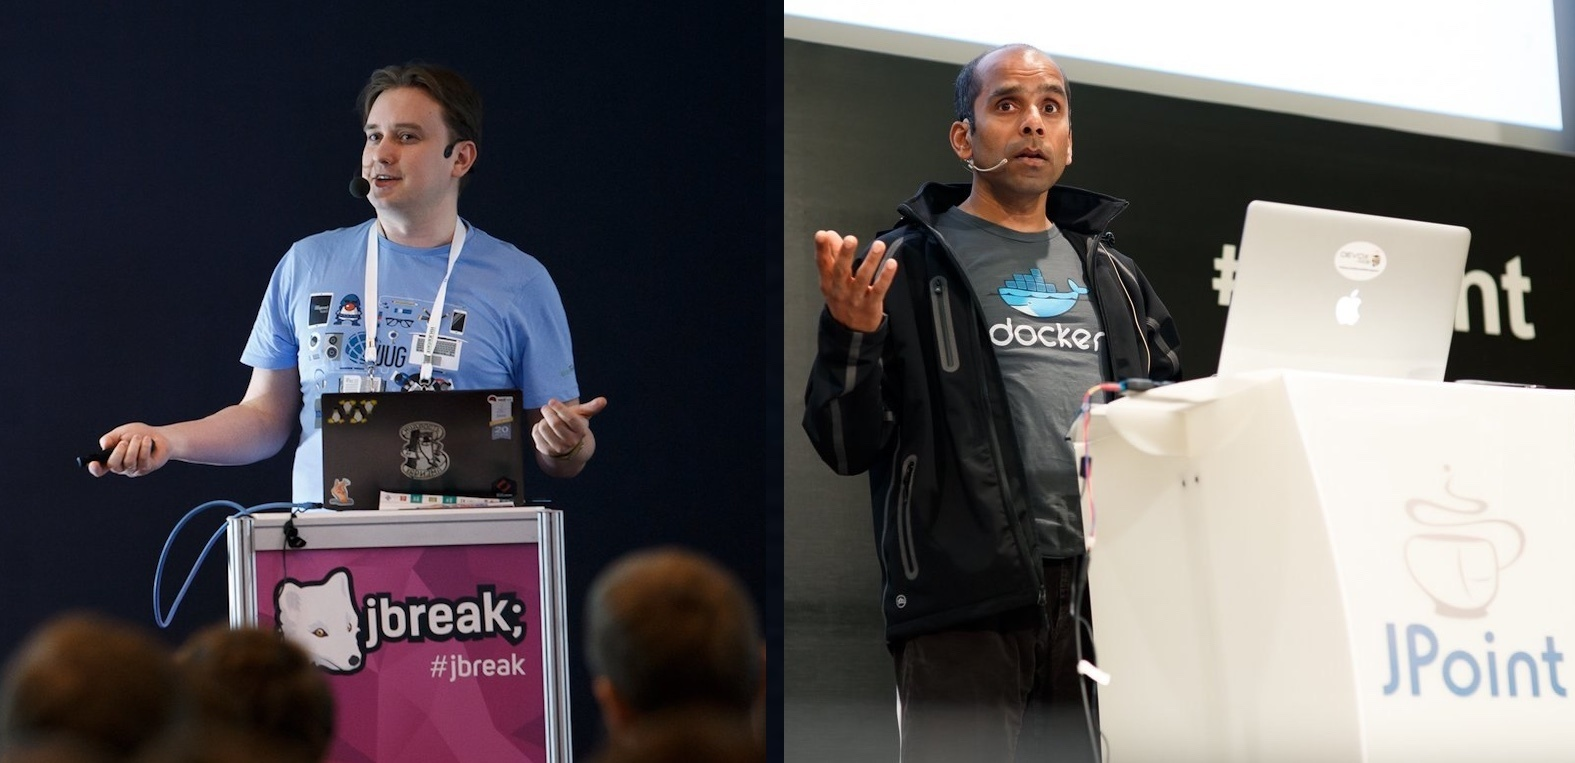 Два сапога Java: как прошли JBreak и JPoint 2017 - 1